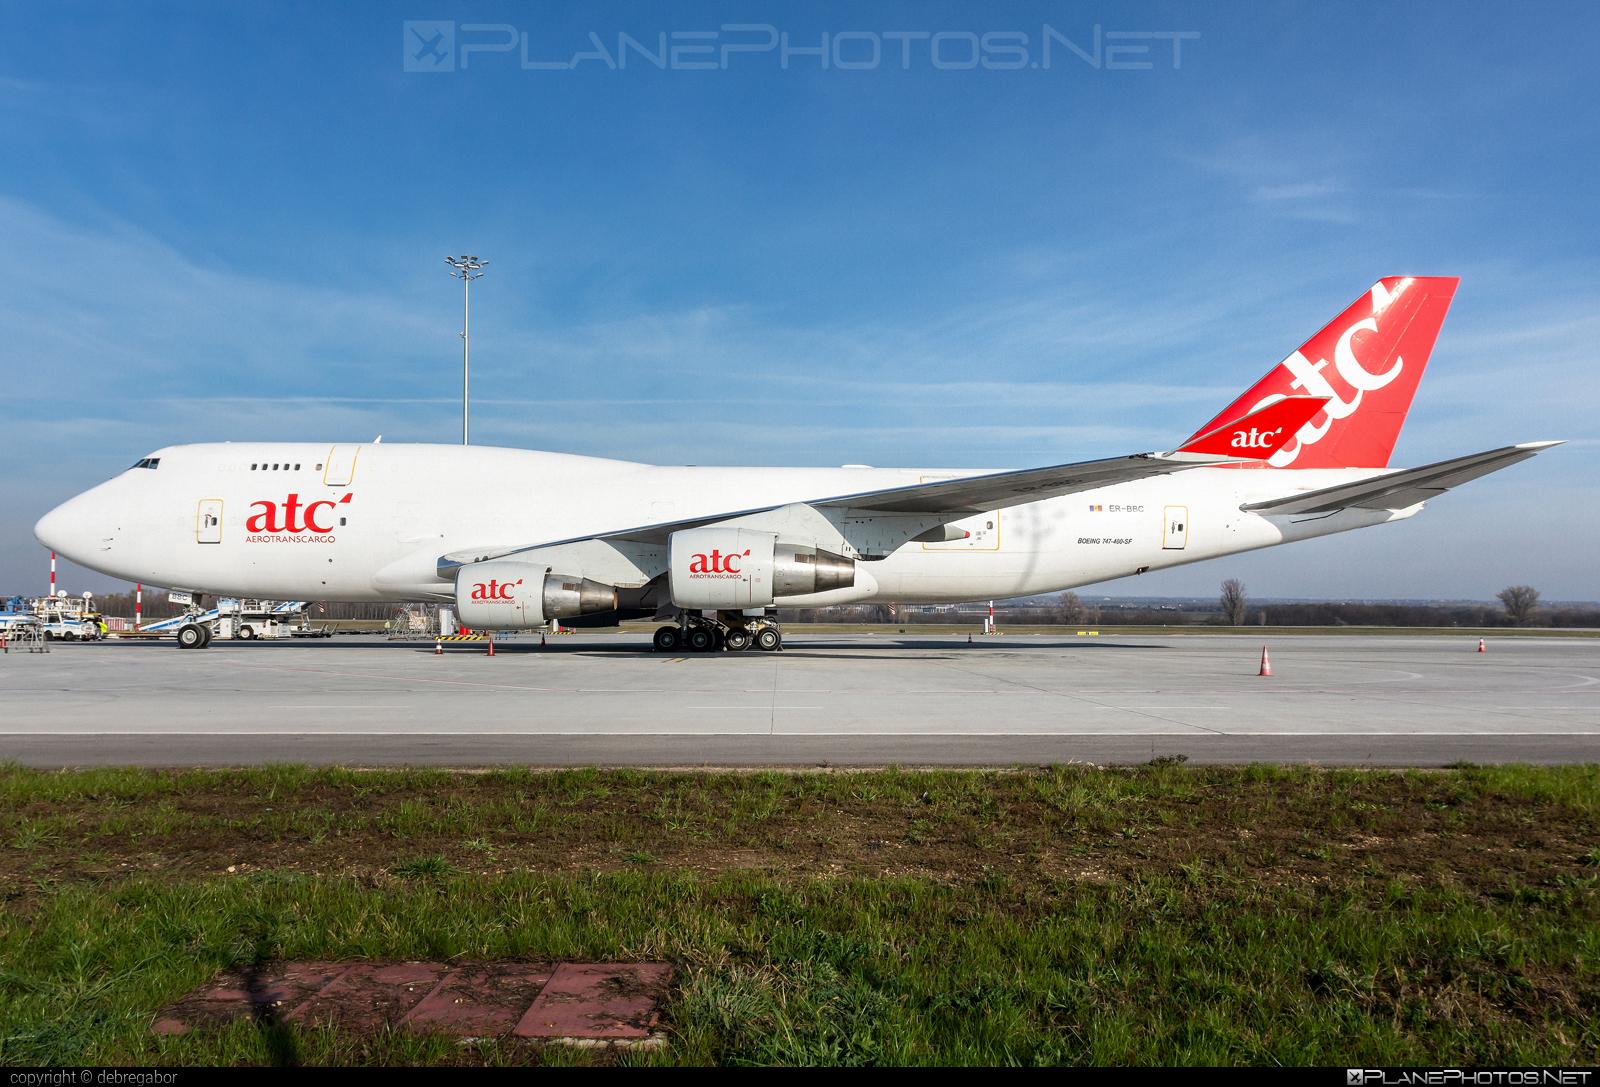 Boeing 747-400BDSF - ER-BBC operated by Aerotrans Cargo #aerotranscargo #b747 #b747bdsf #b747freighter #bedekspecialfreighter #boeing #boeing747 #jumbo